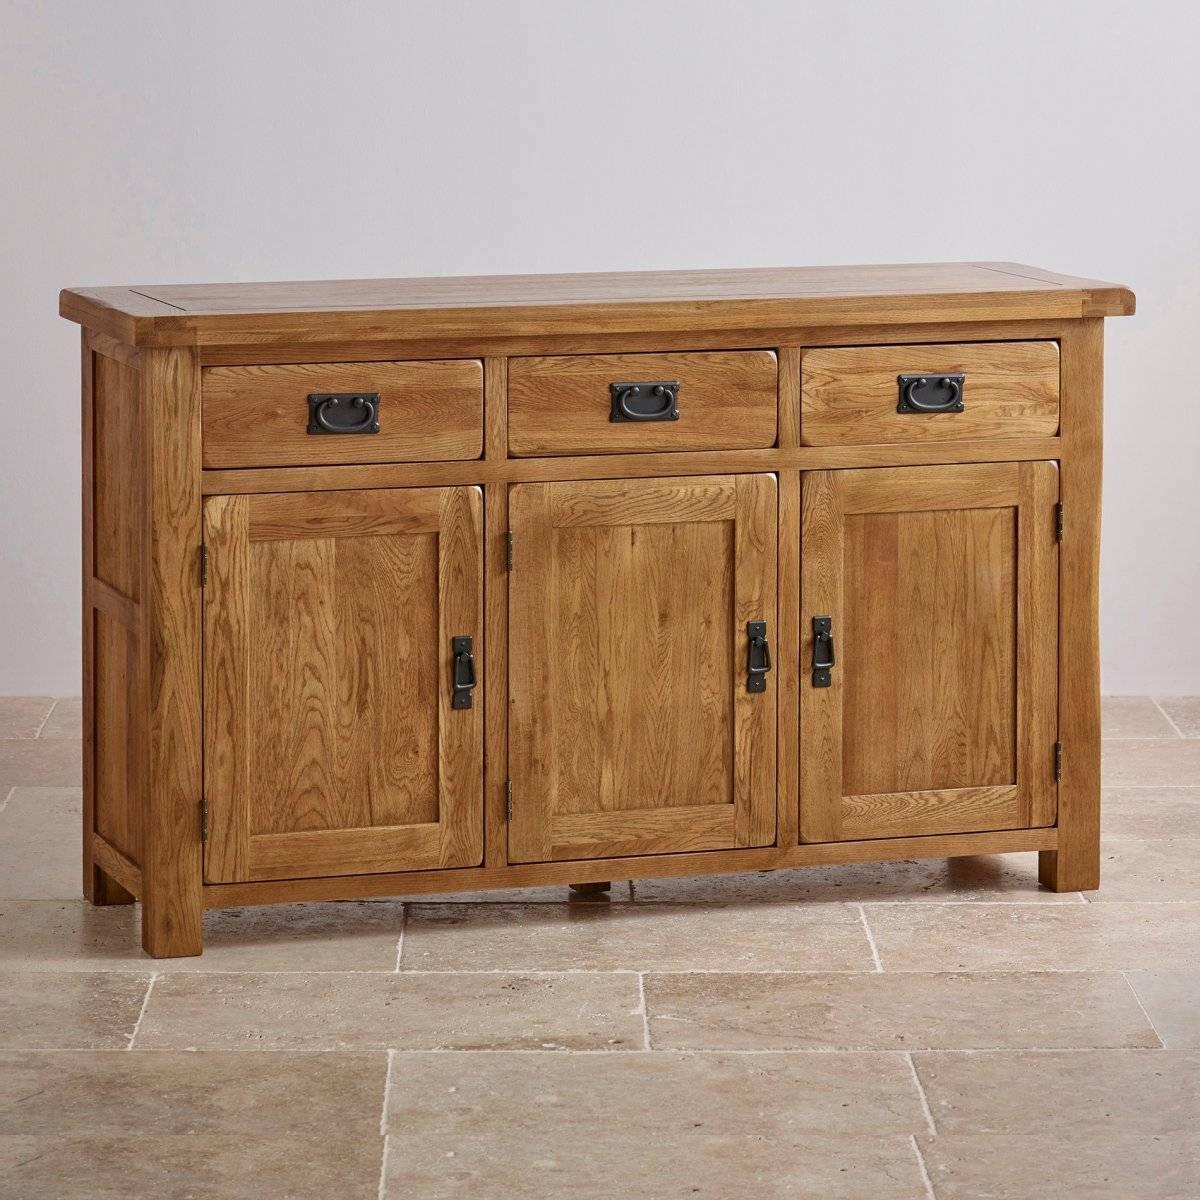 Original Rustic Large Sideboard In Solid Oak | Oak Furniture Land Throughout Oak Sideboards (#13 of 20)